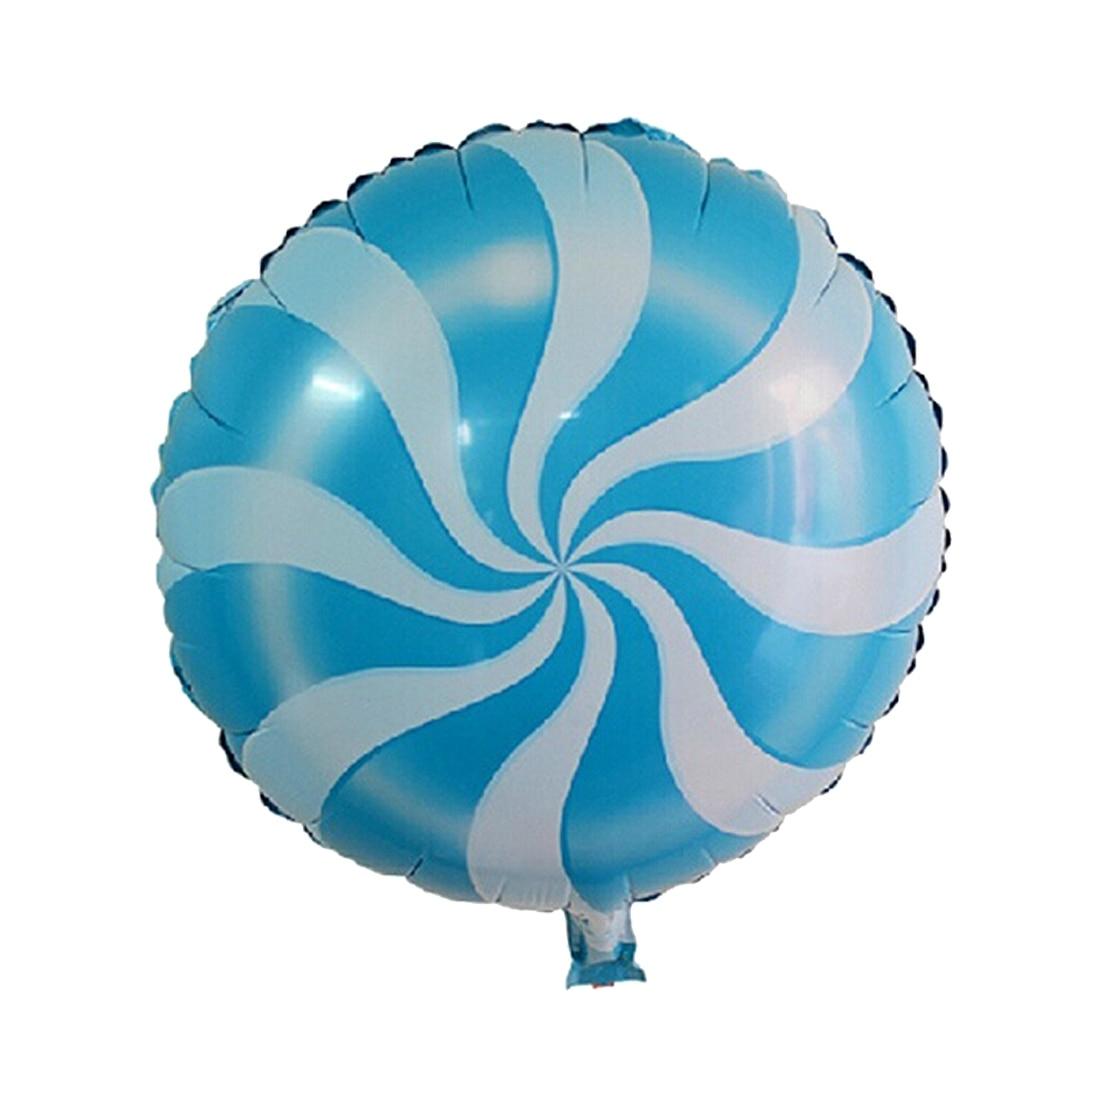 2PCS Candy Balloons Lollipops Swirl Peppermint Wedding Foil Party Decoration